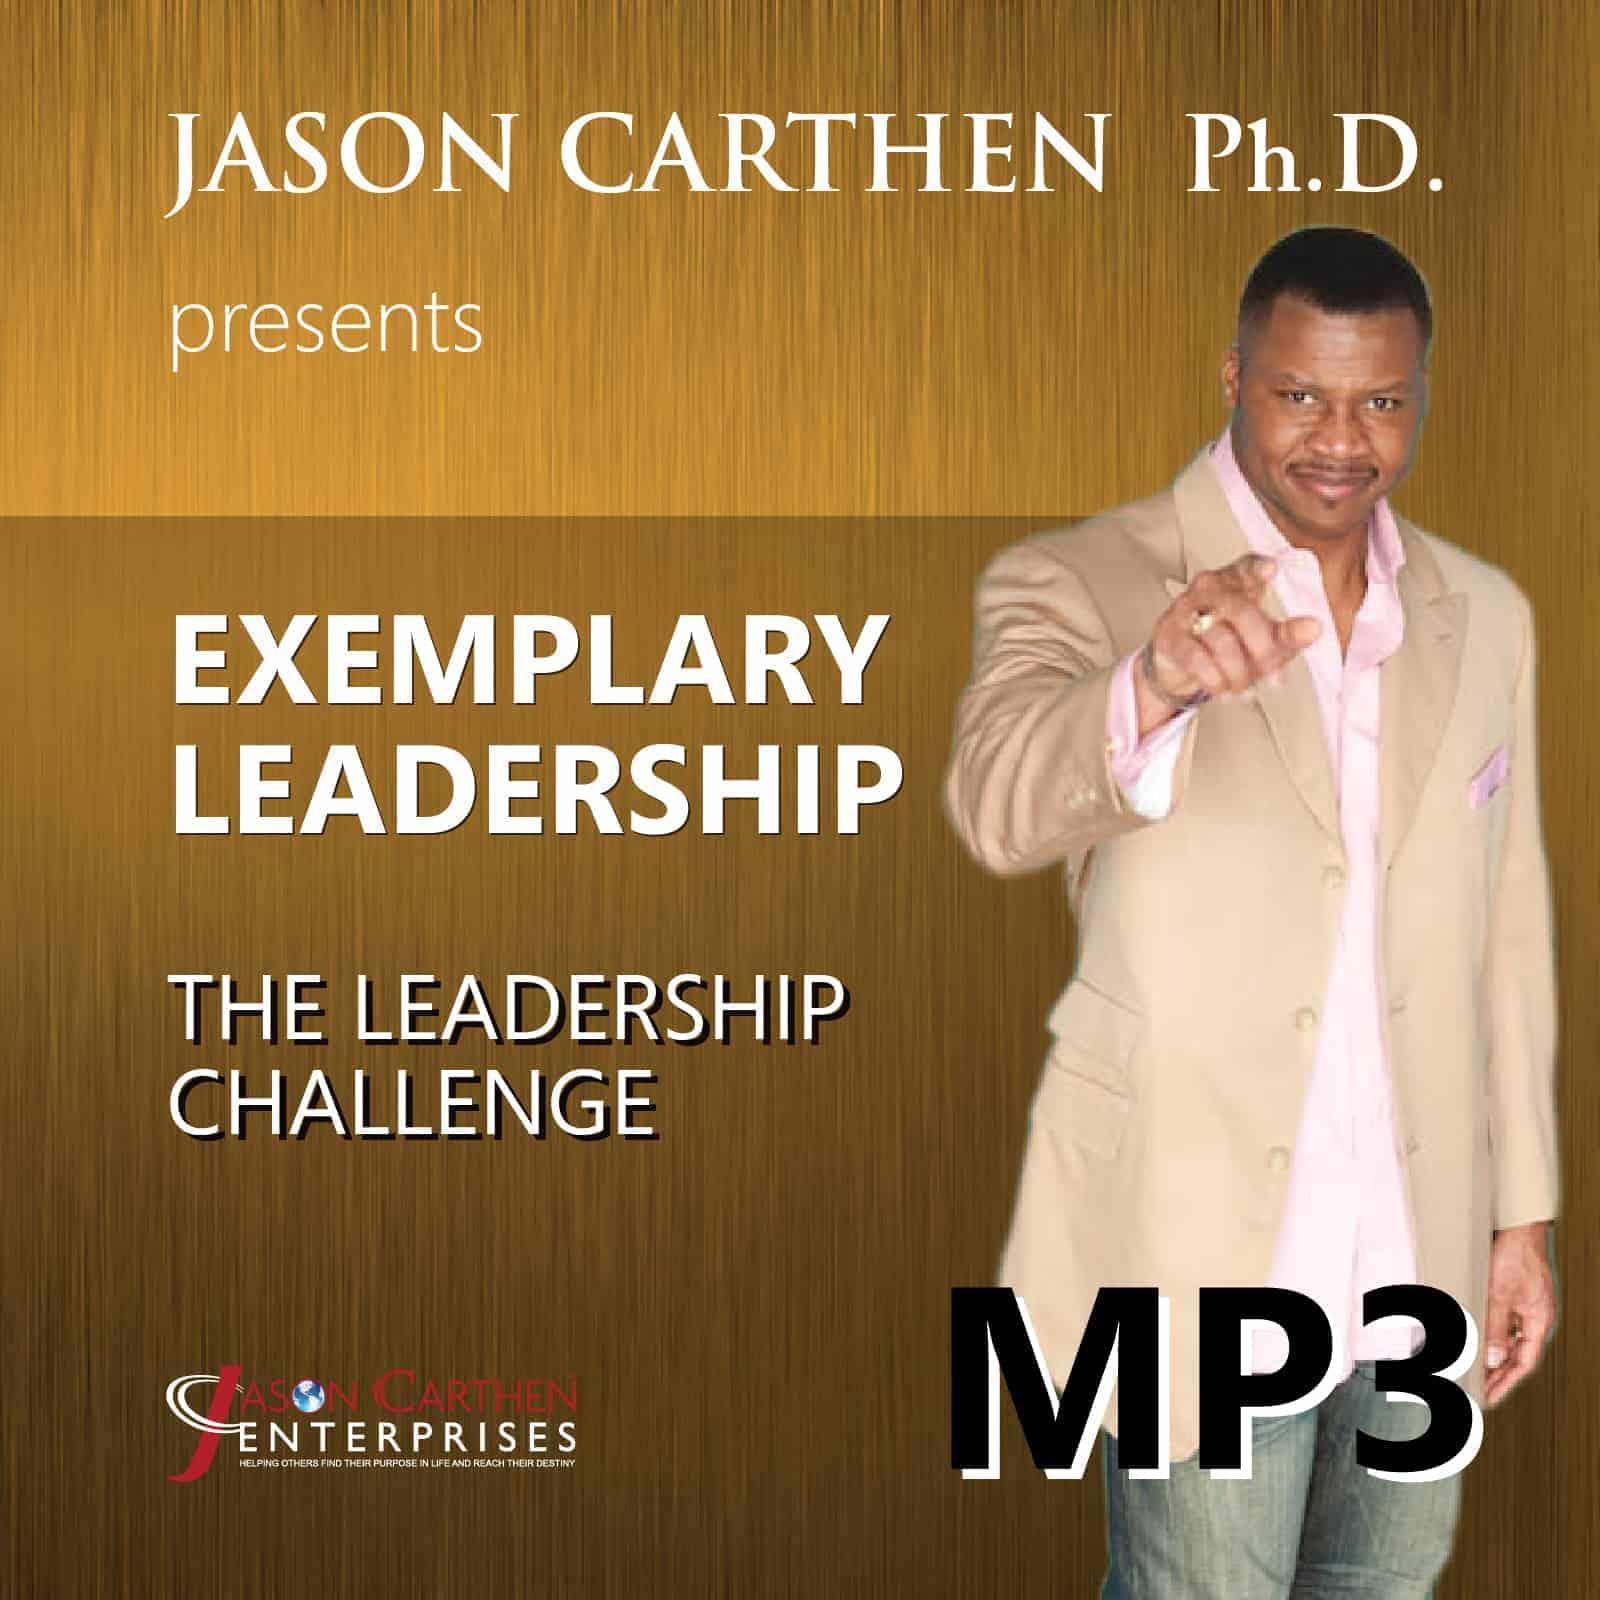 Dr. Jason Carthen: The Leadership Challenge